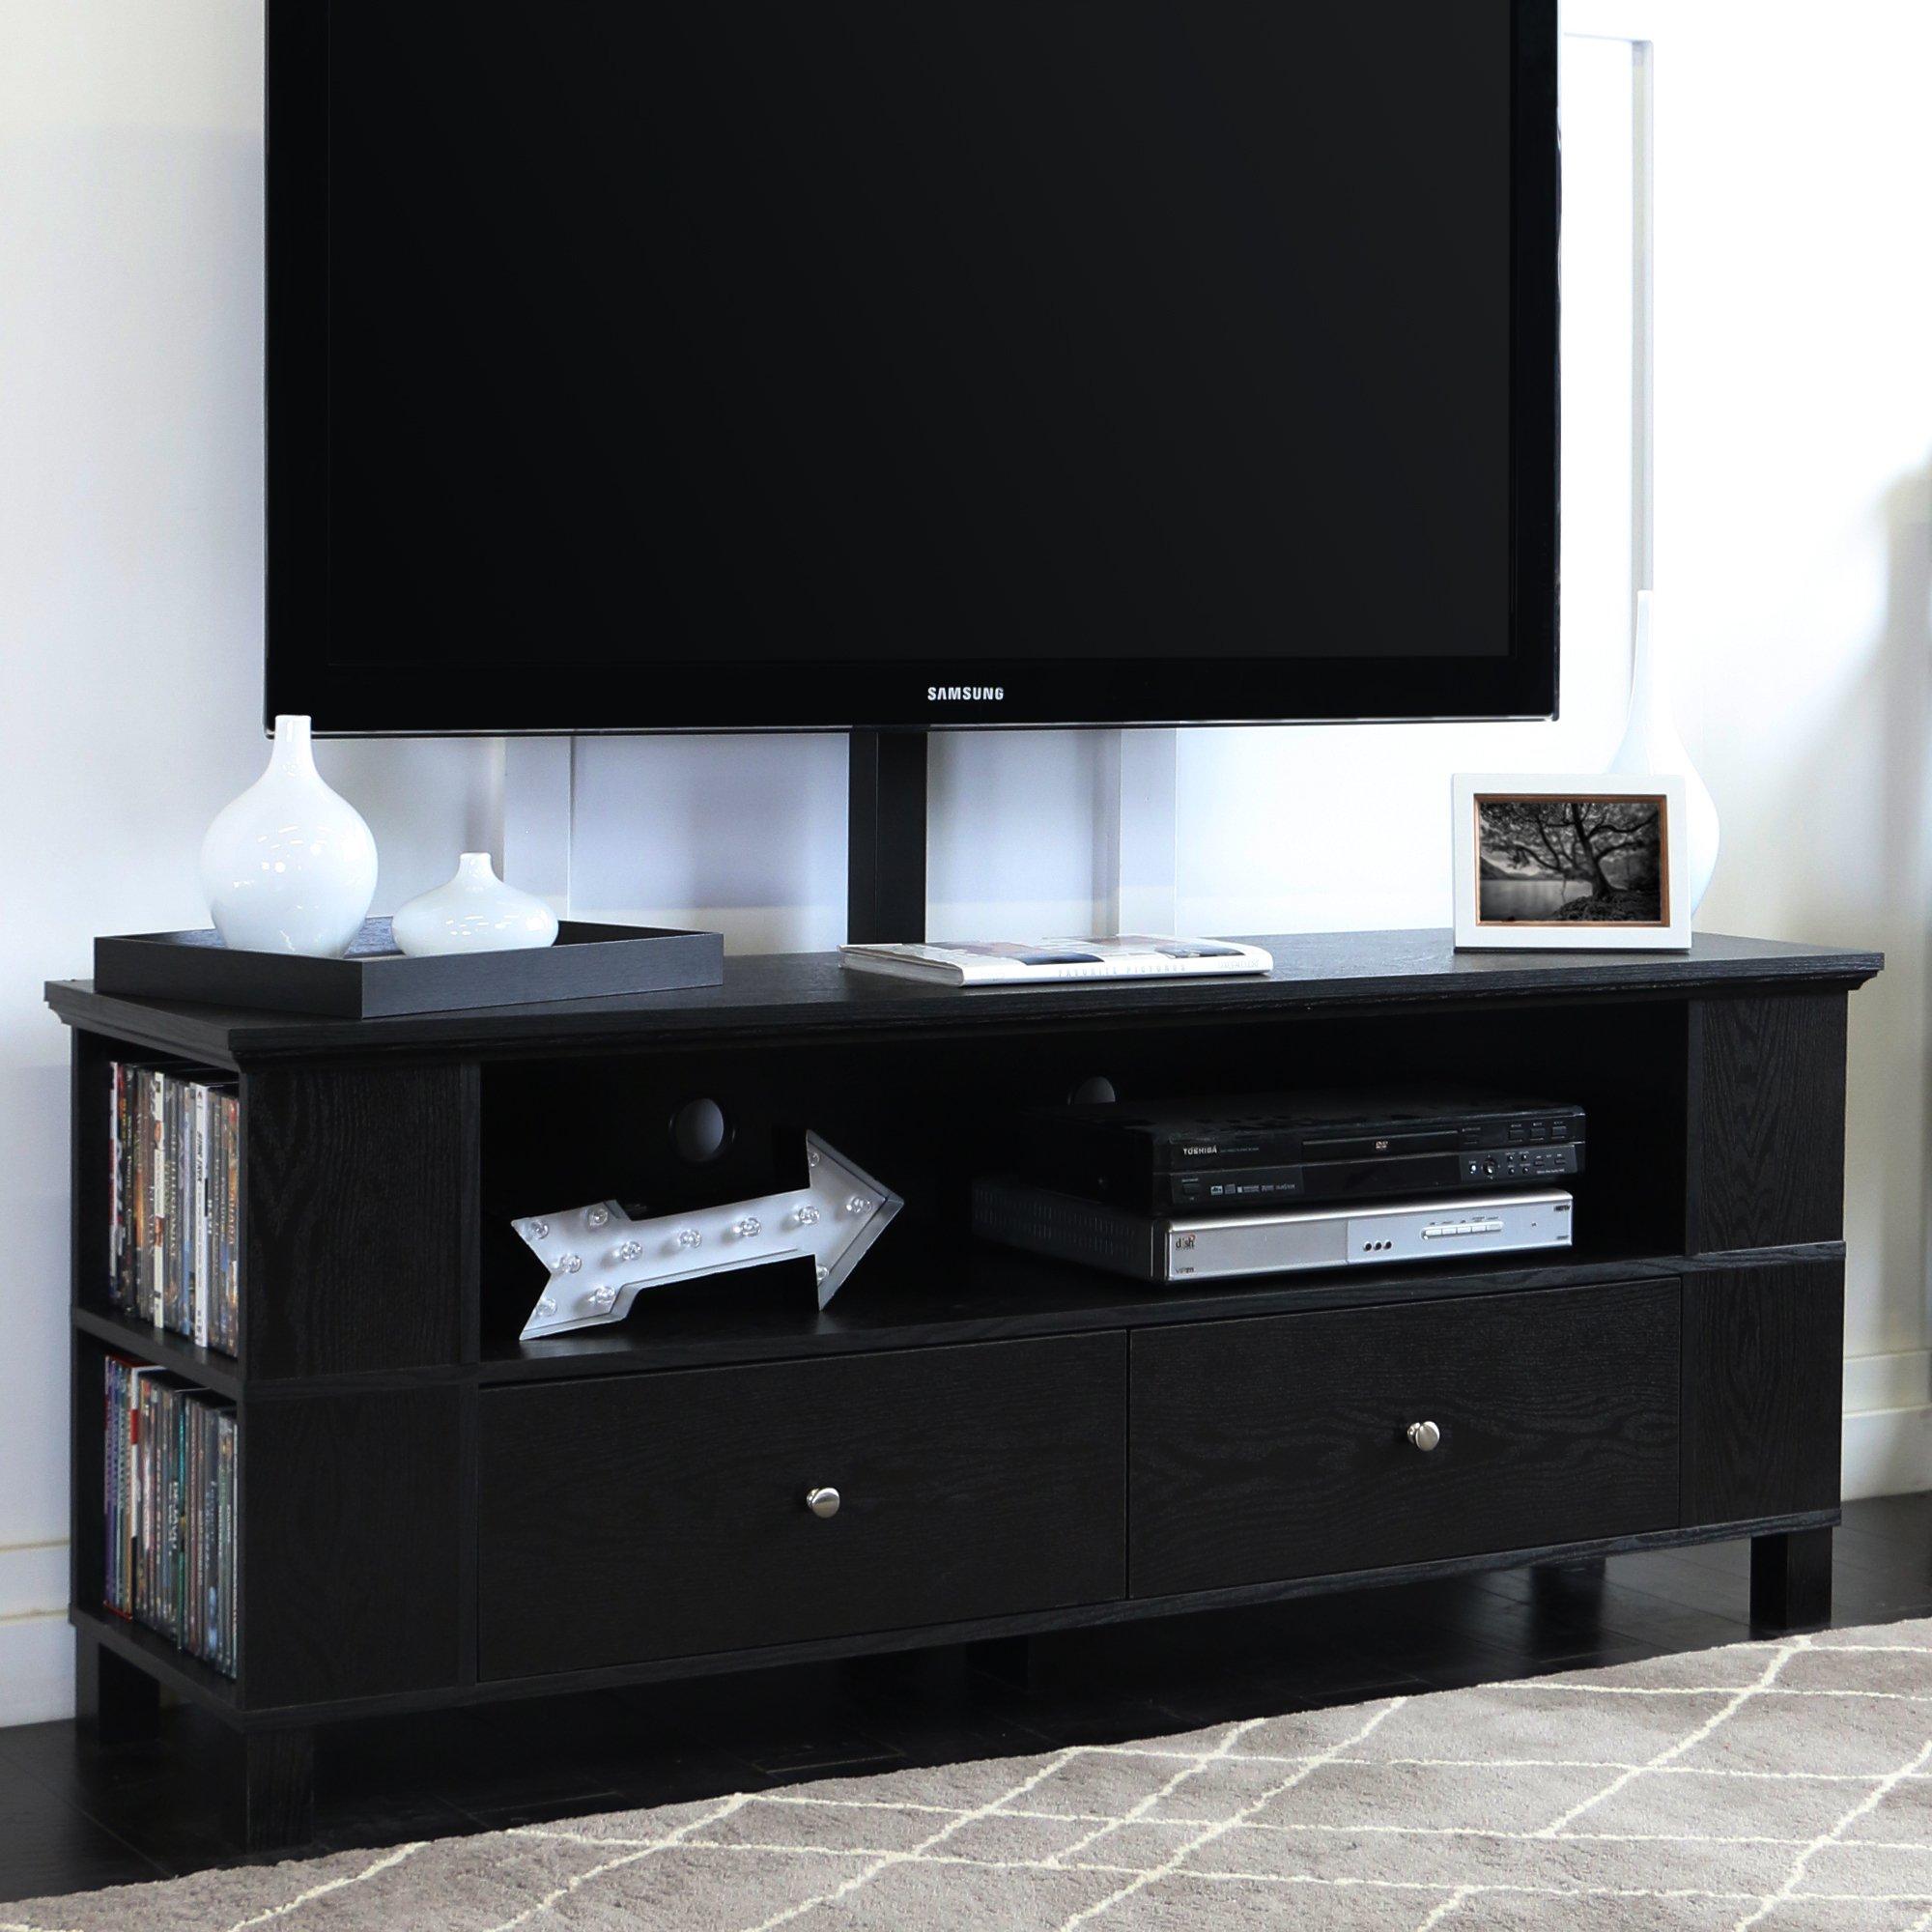 Walker Edison 58'' Black Wood Storage TV Cabinet with Mount by Walker Edison Furniture Company